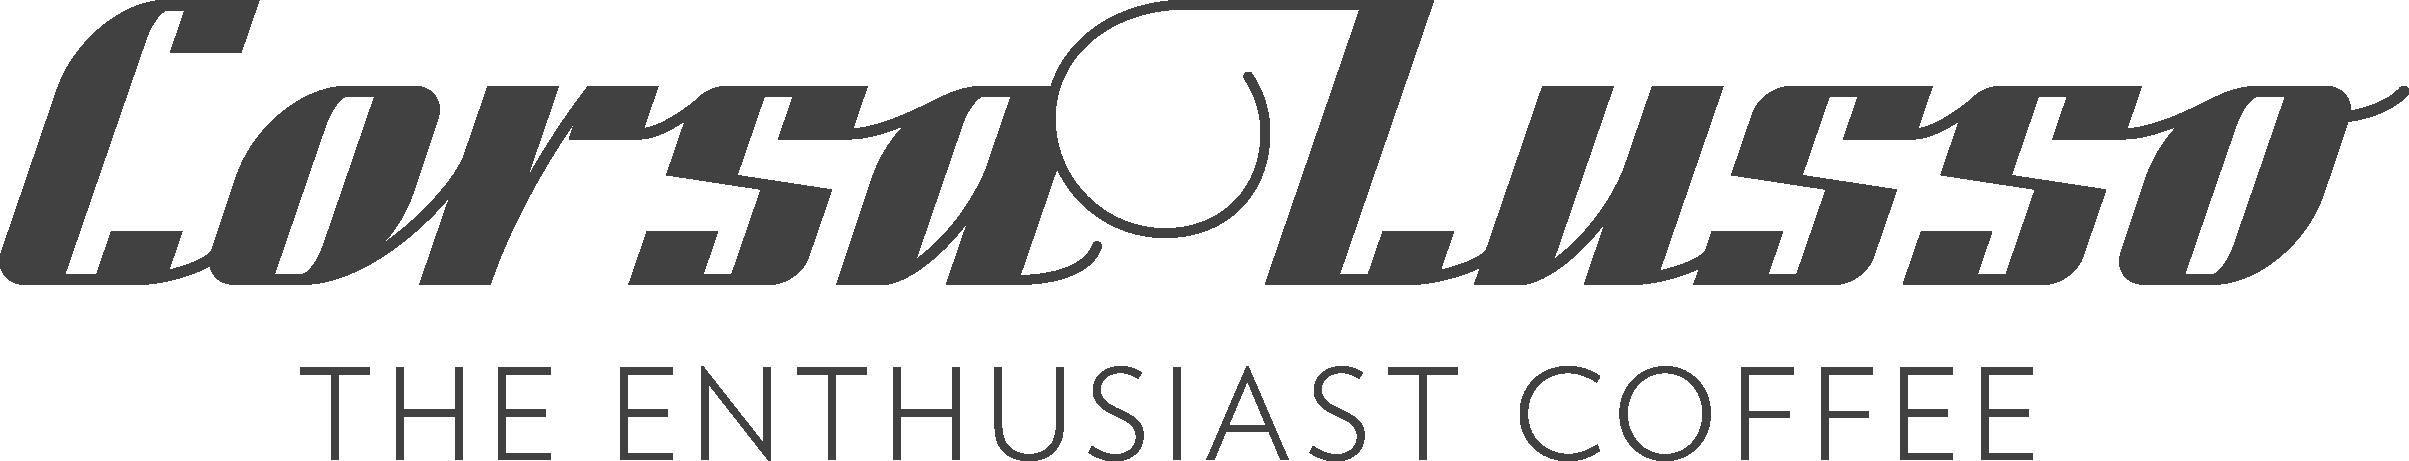 CorsaLussoBranding_LogoType-Descriptor_Black.png